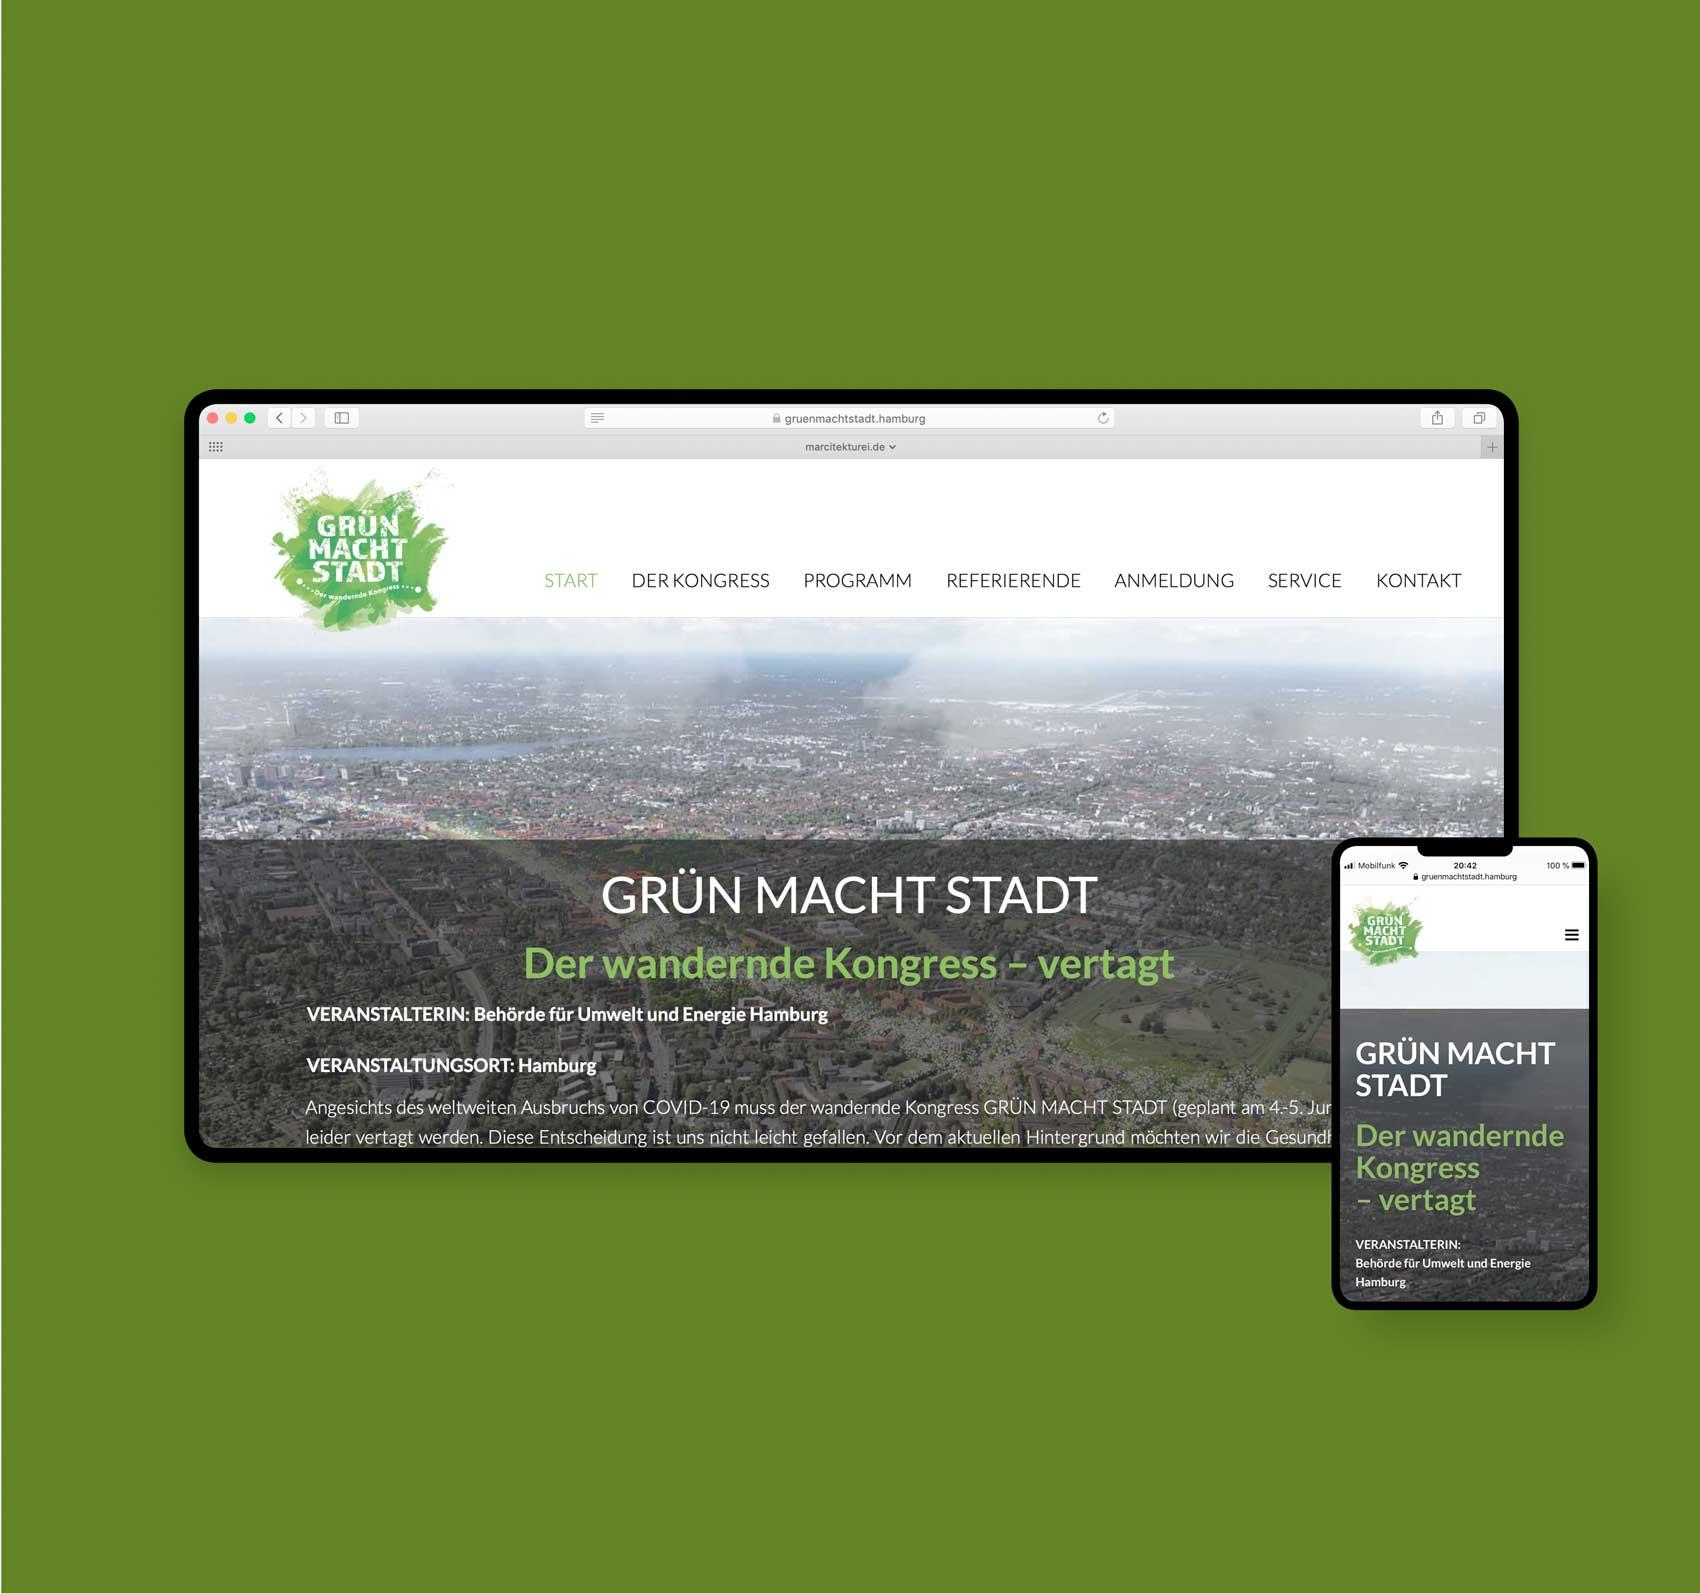 Webdesigner aus Hamburg | gruenmachtstadt.hamburg